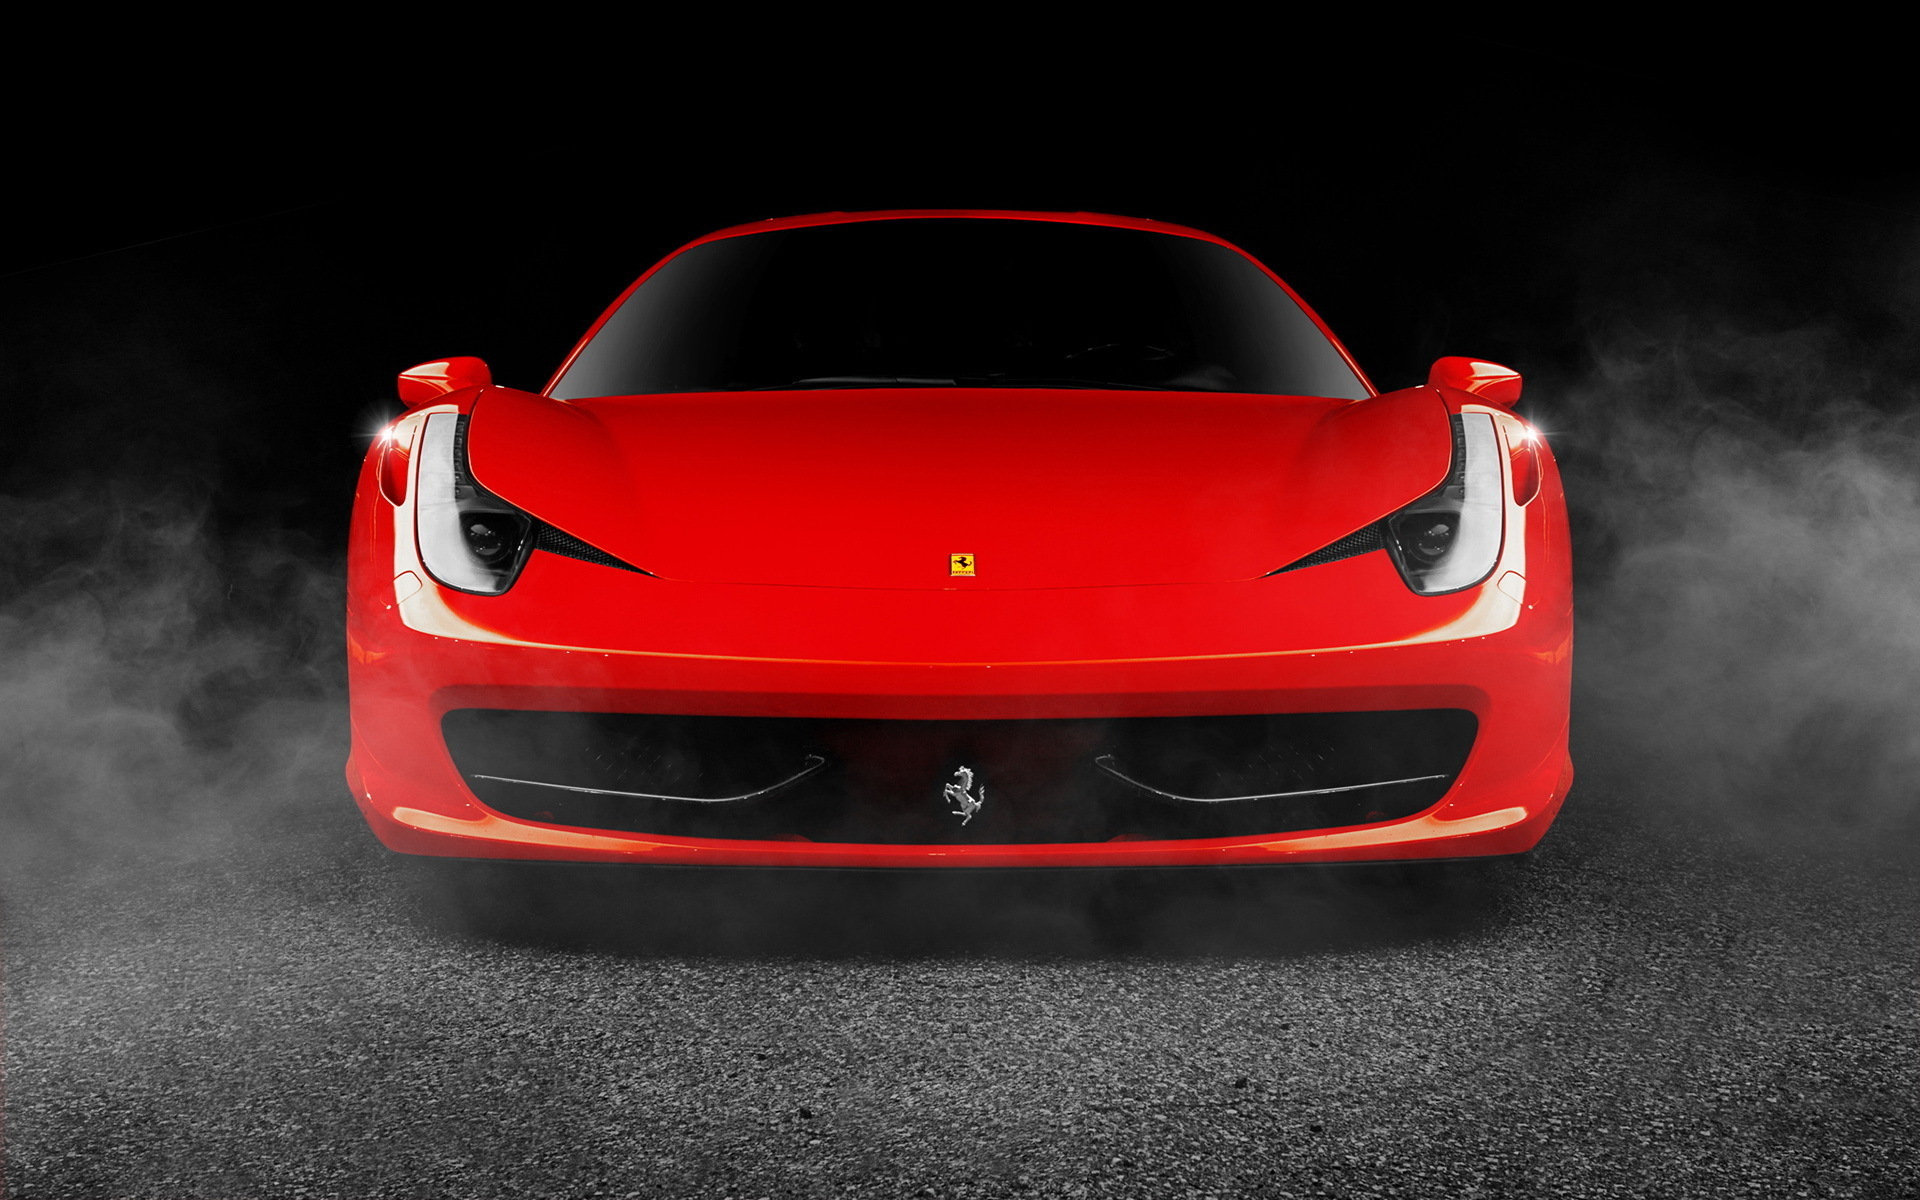 Ferrari 458 Italia wallpaper 23077 1920x1200